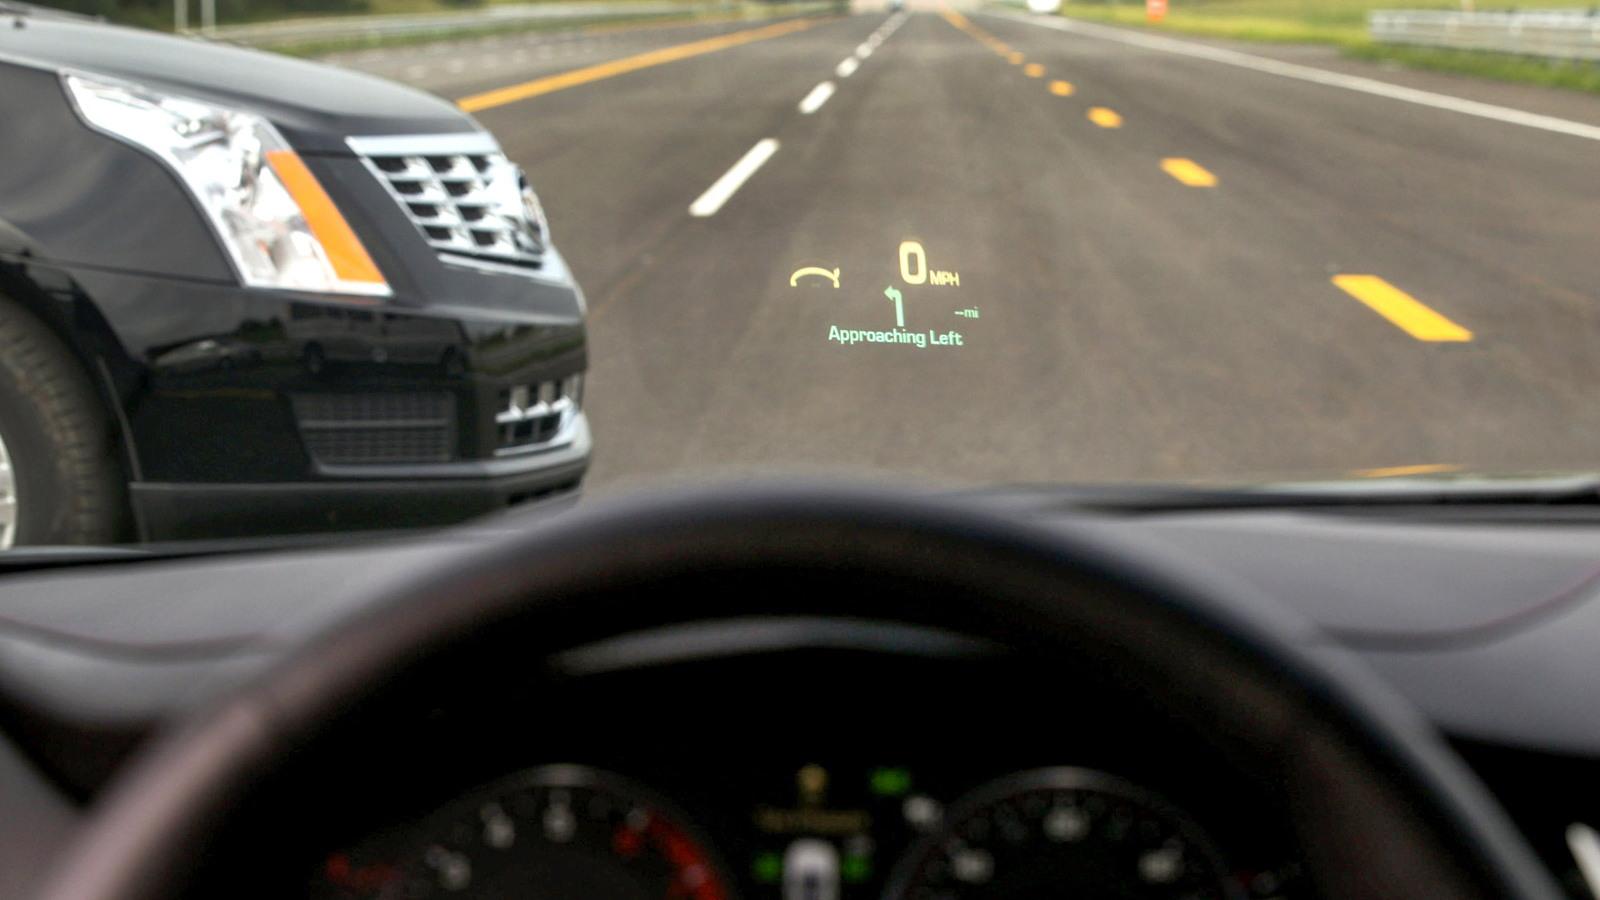 Cadillac semi-autonomous and connected car technology